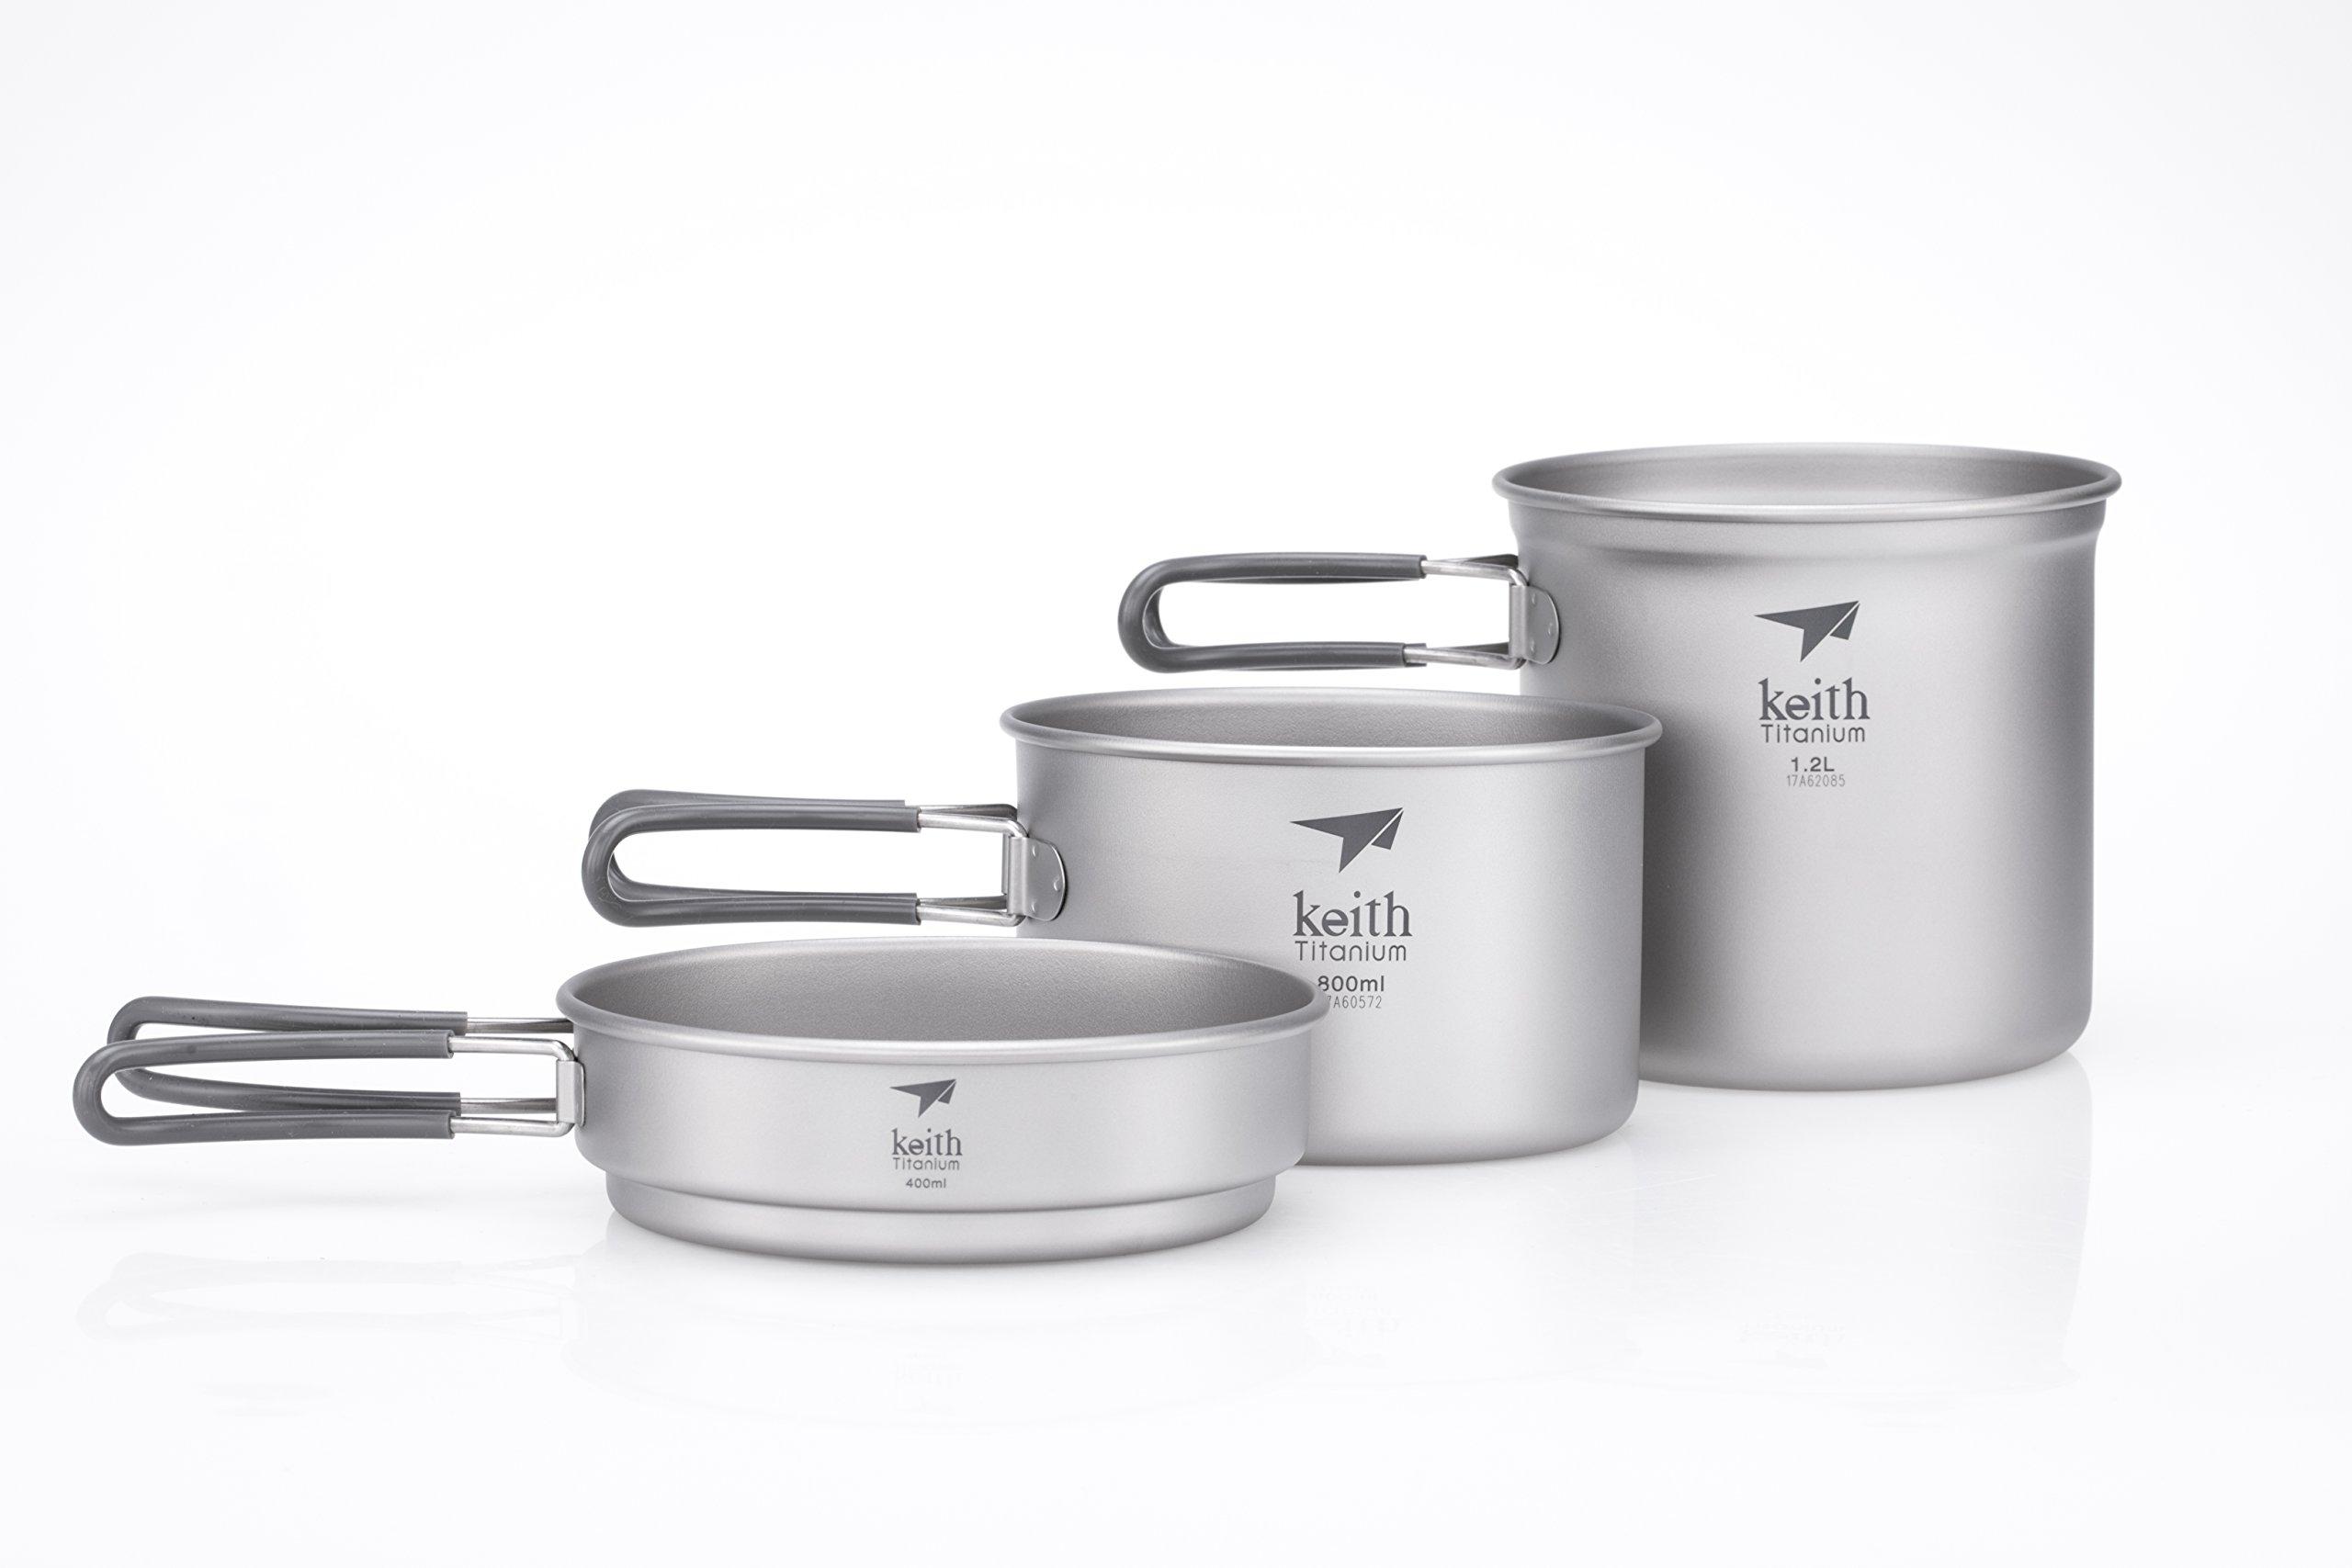 Keith Titanium Ti6014 3-Piece Pot and Pan Cook Set - 2400ml (Limited Time Price) by Keith Titanium